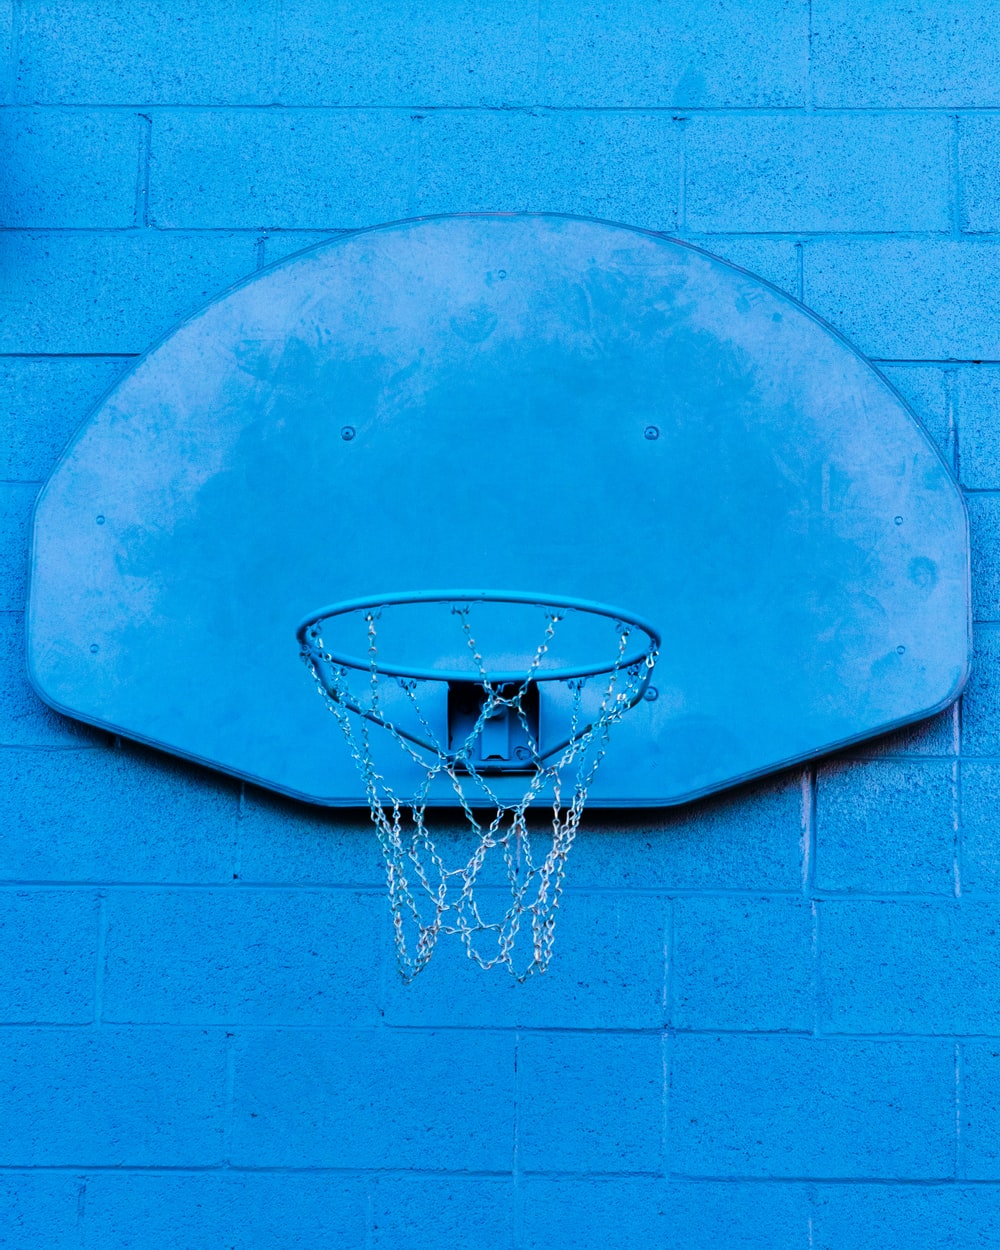 blue and gray basketball hoop